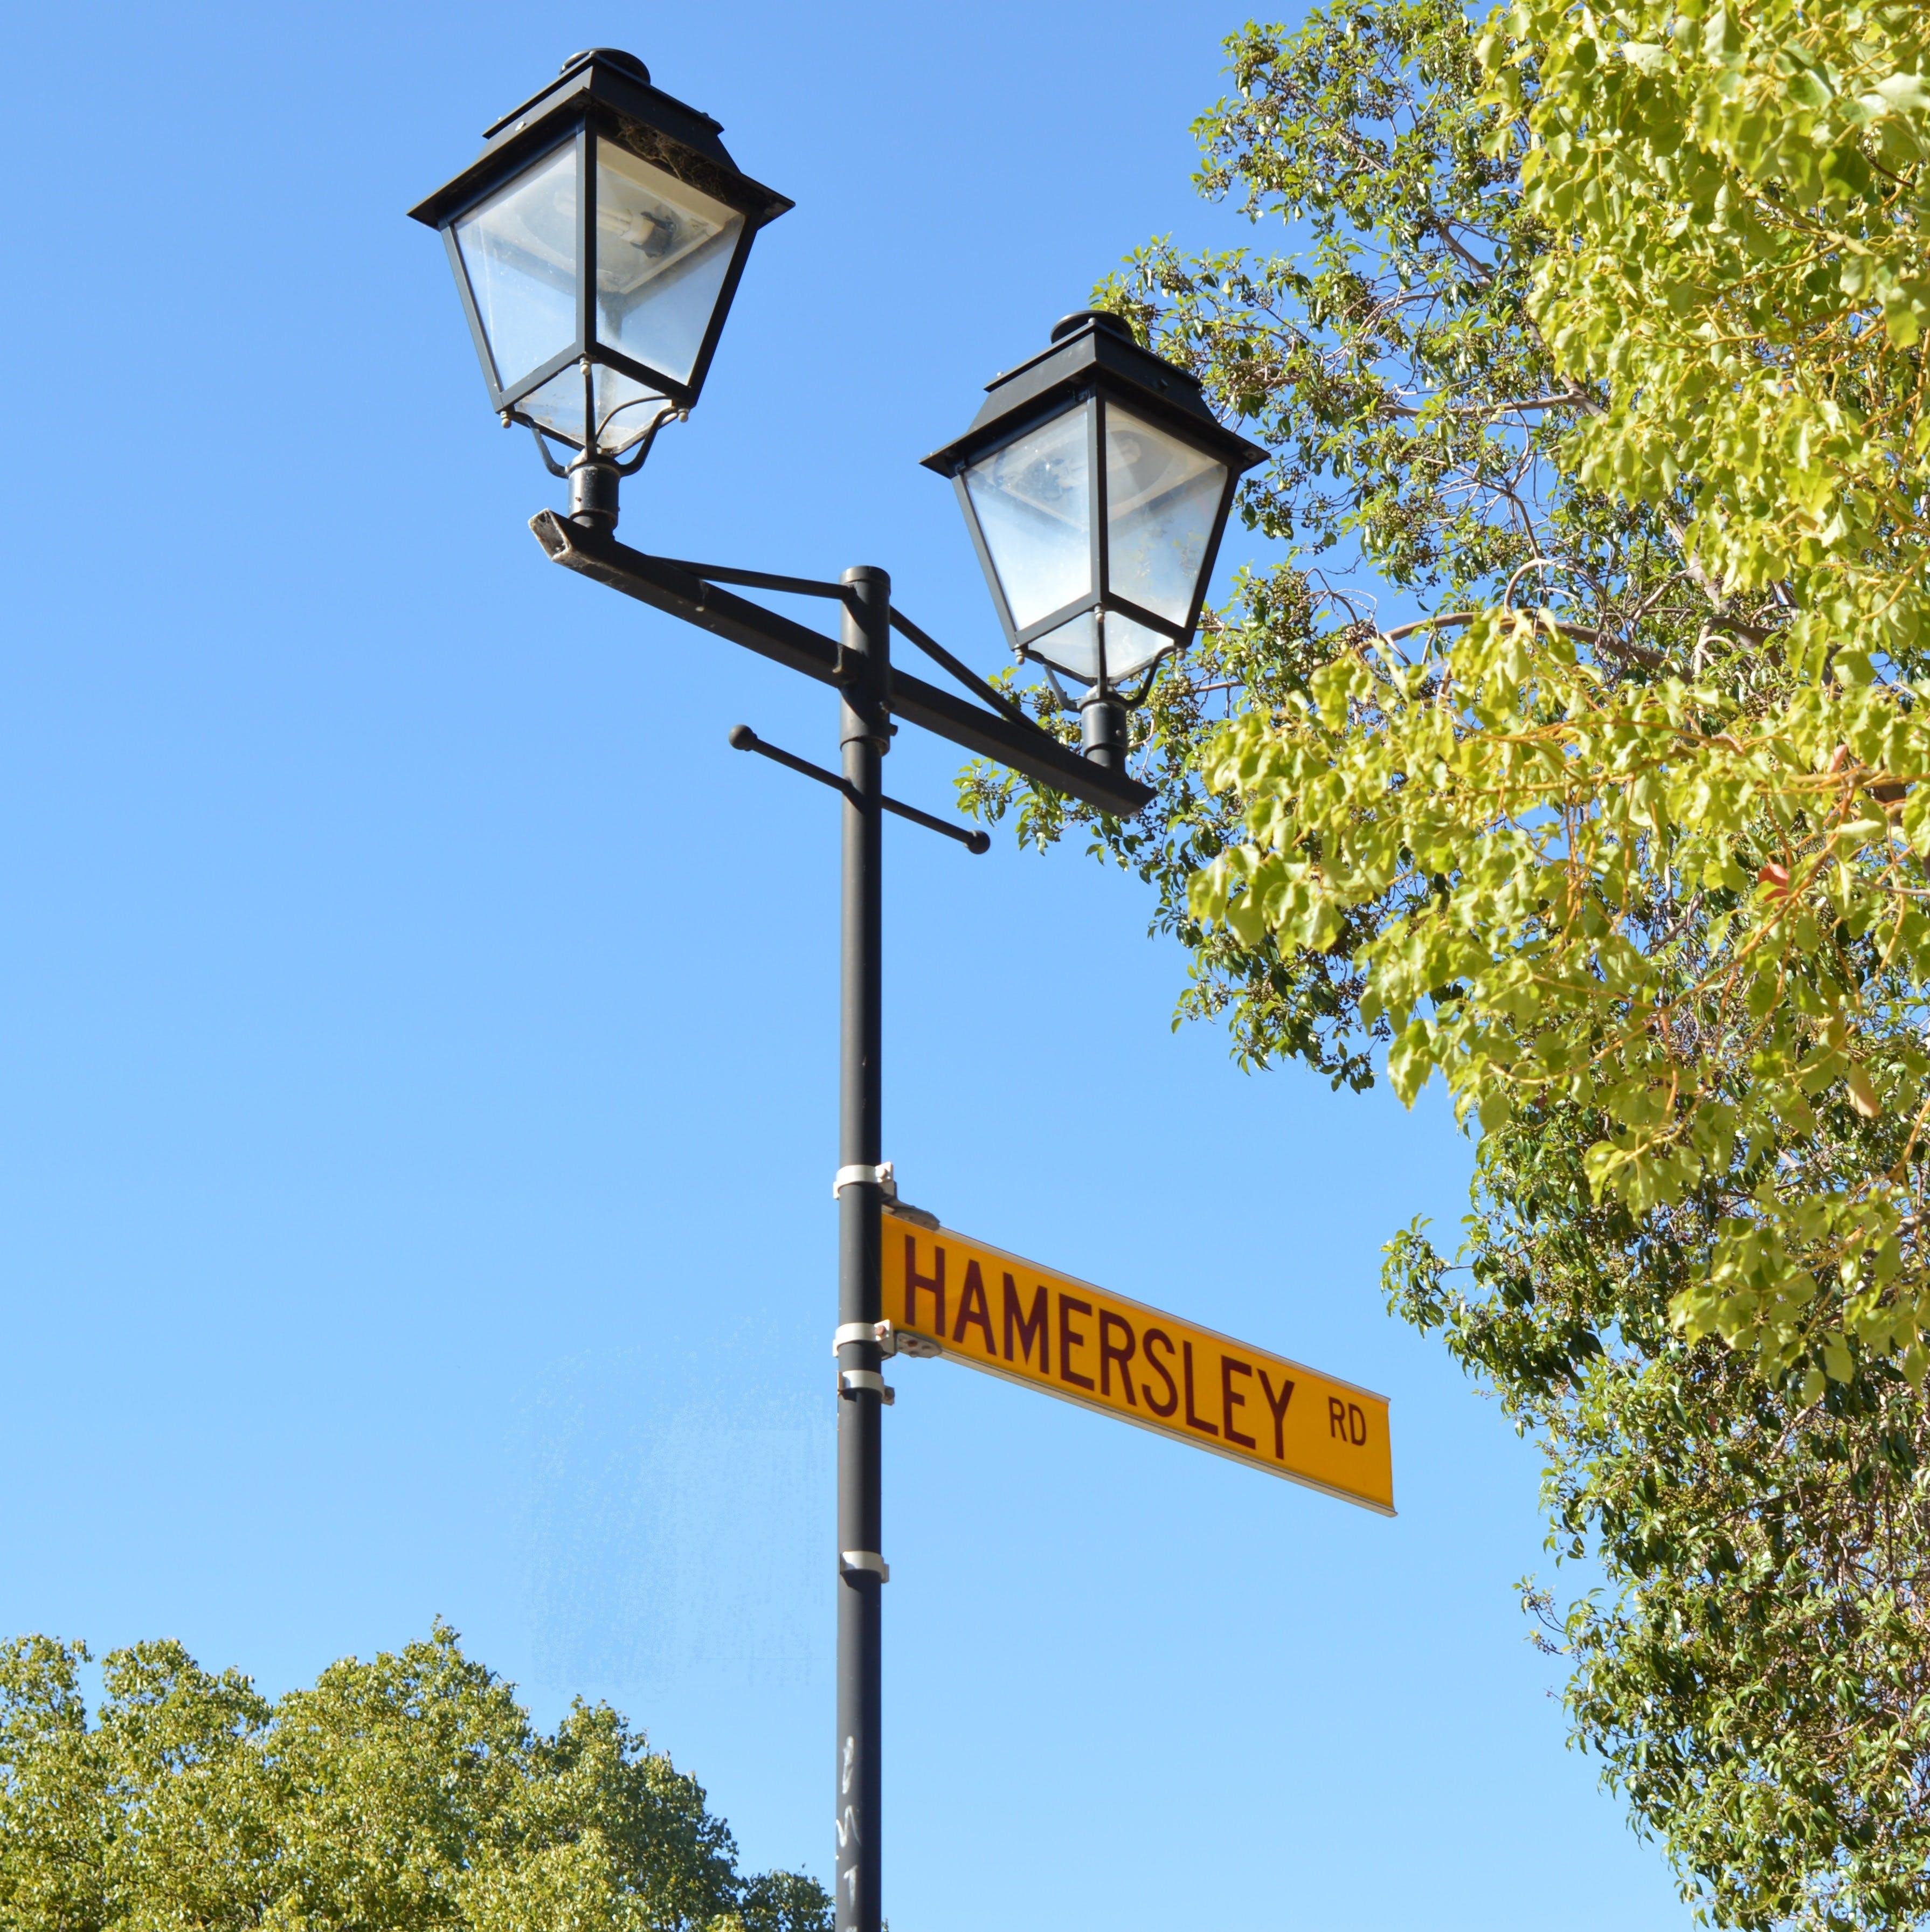 Hamersleyrdstreetlight square